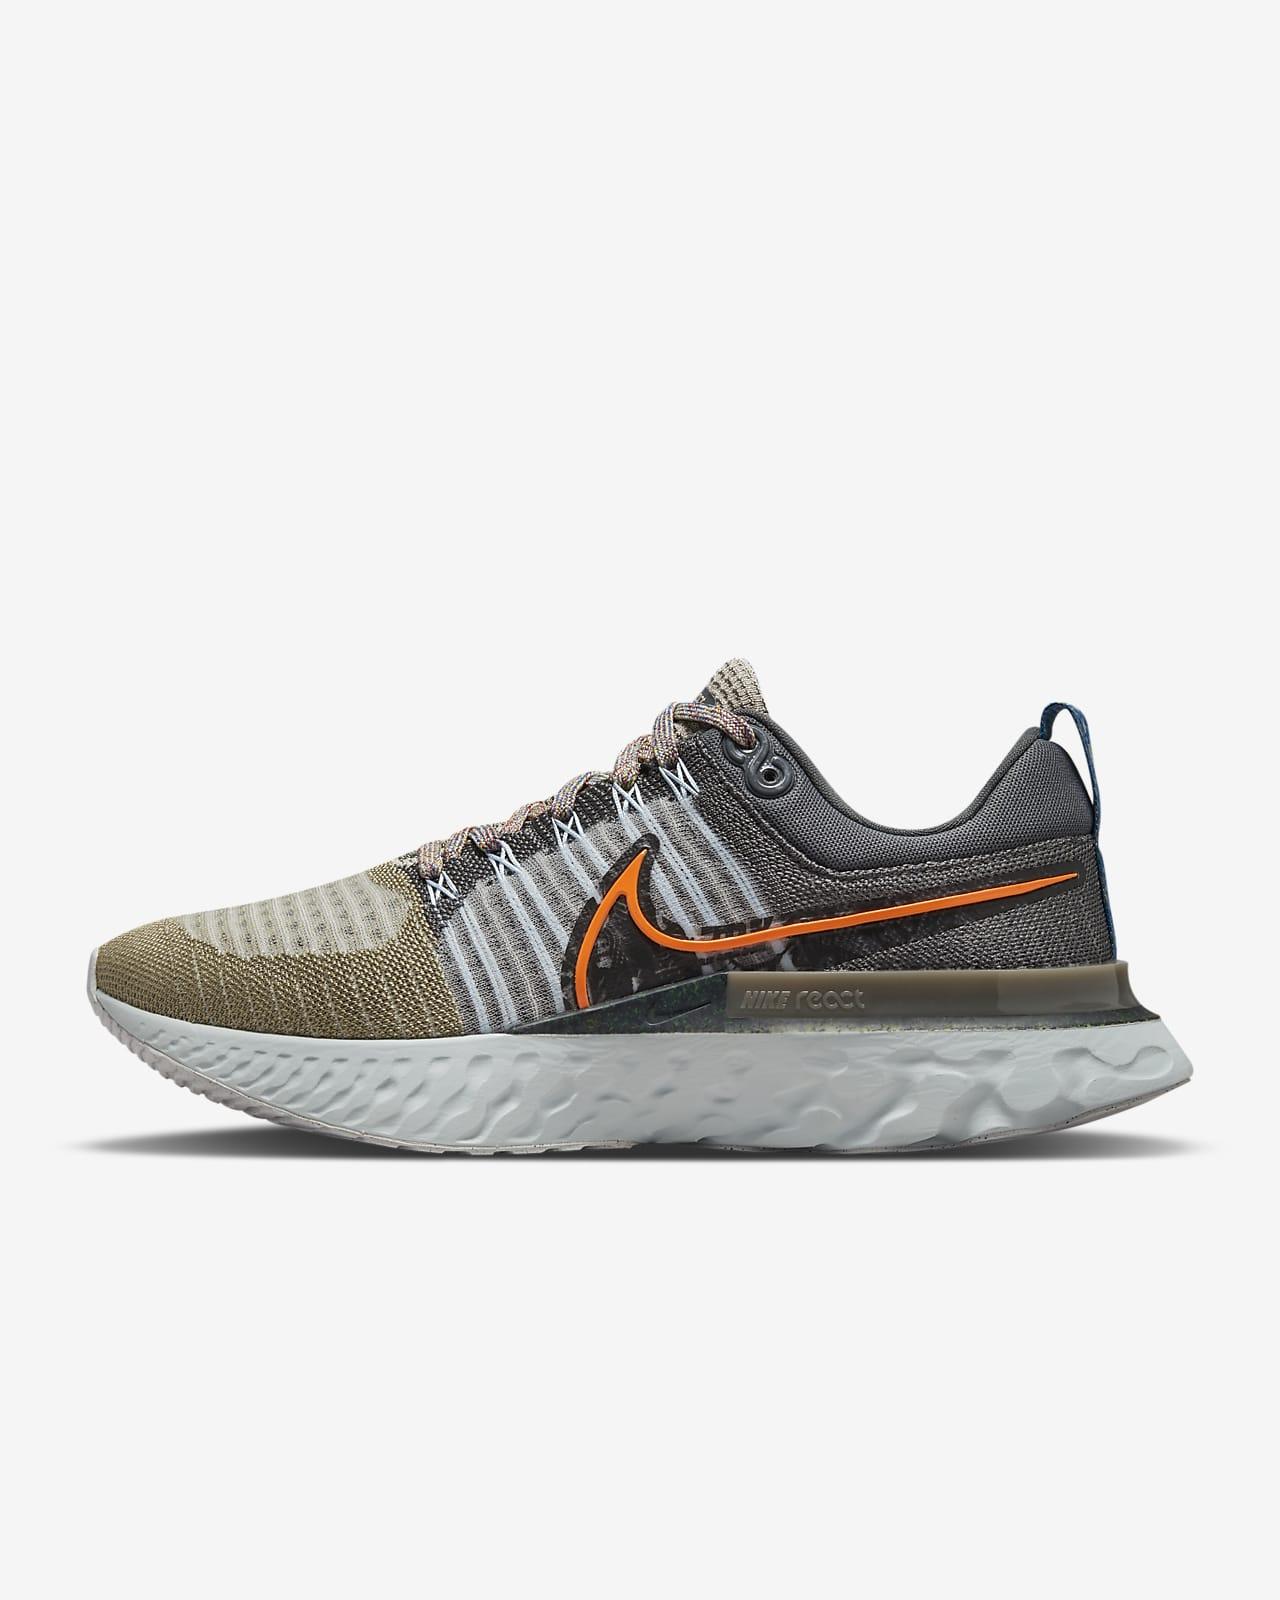 Scarpa da running su strada Nike React Infinity Run Flyknit 2 - Uomo